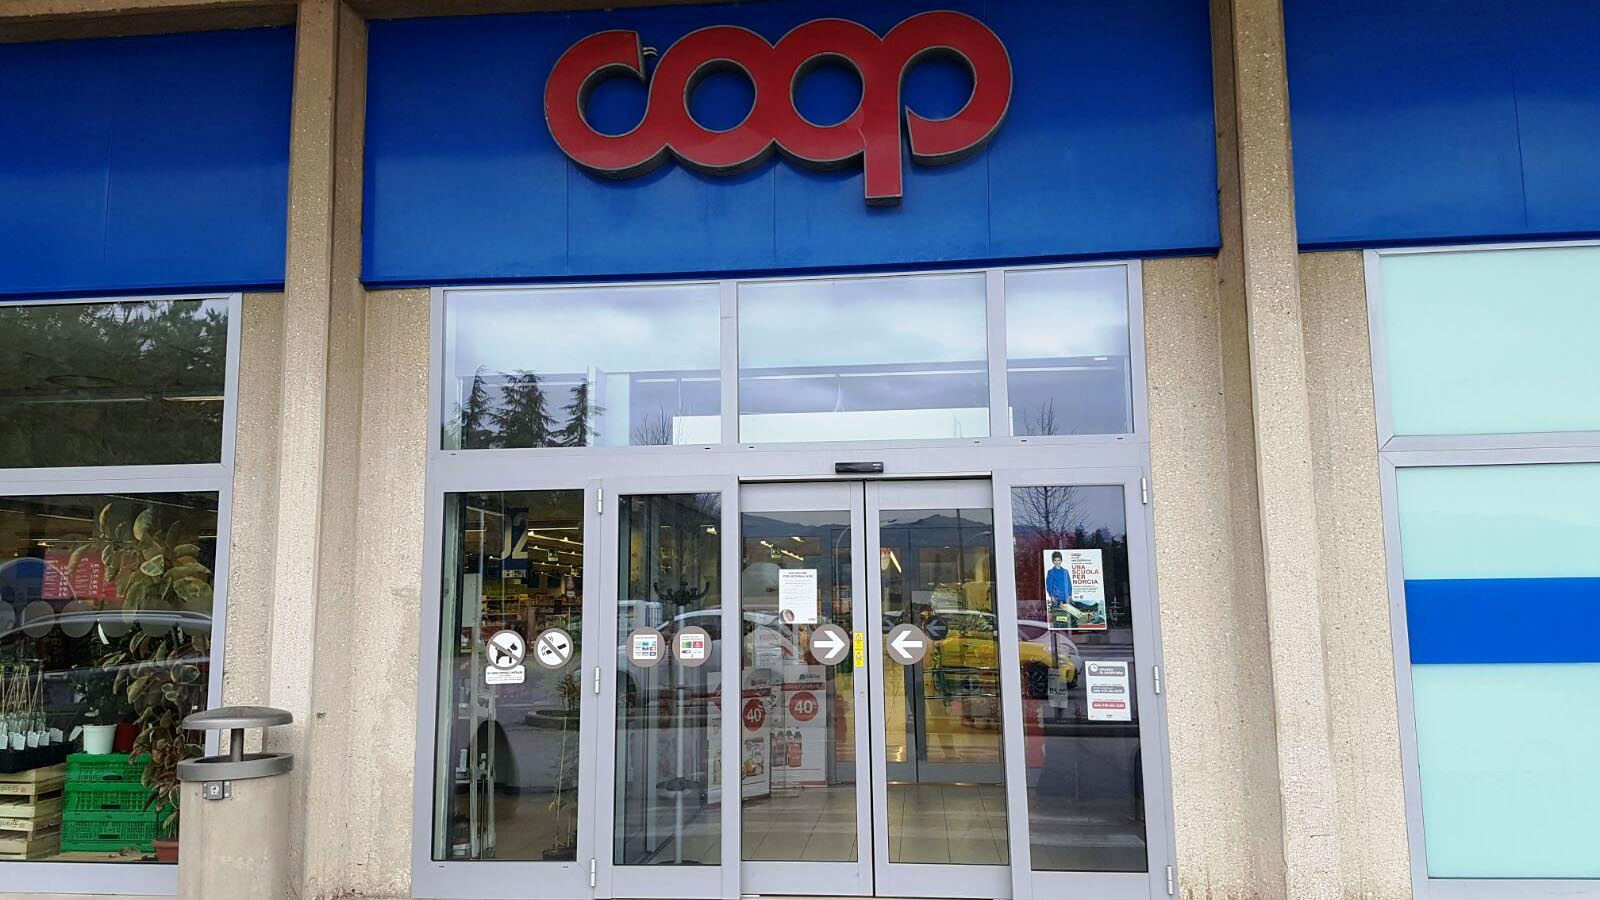 Supermercato Coop Santa Maria degli Angeli Assisi (PG) Offerte e ...